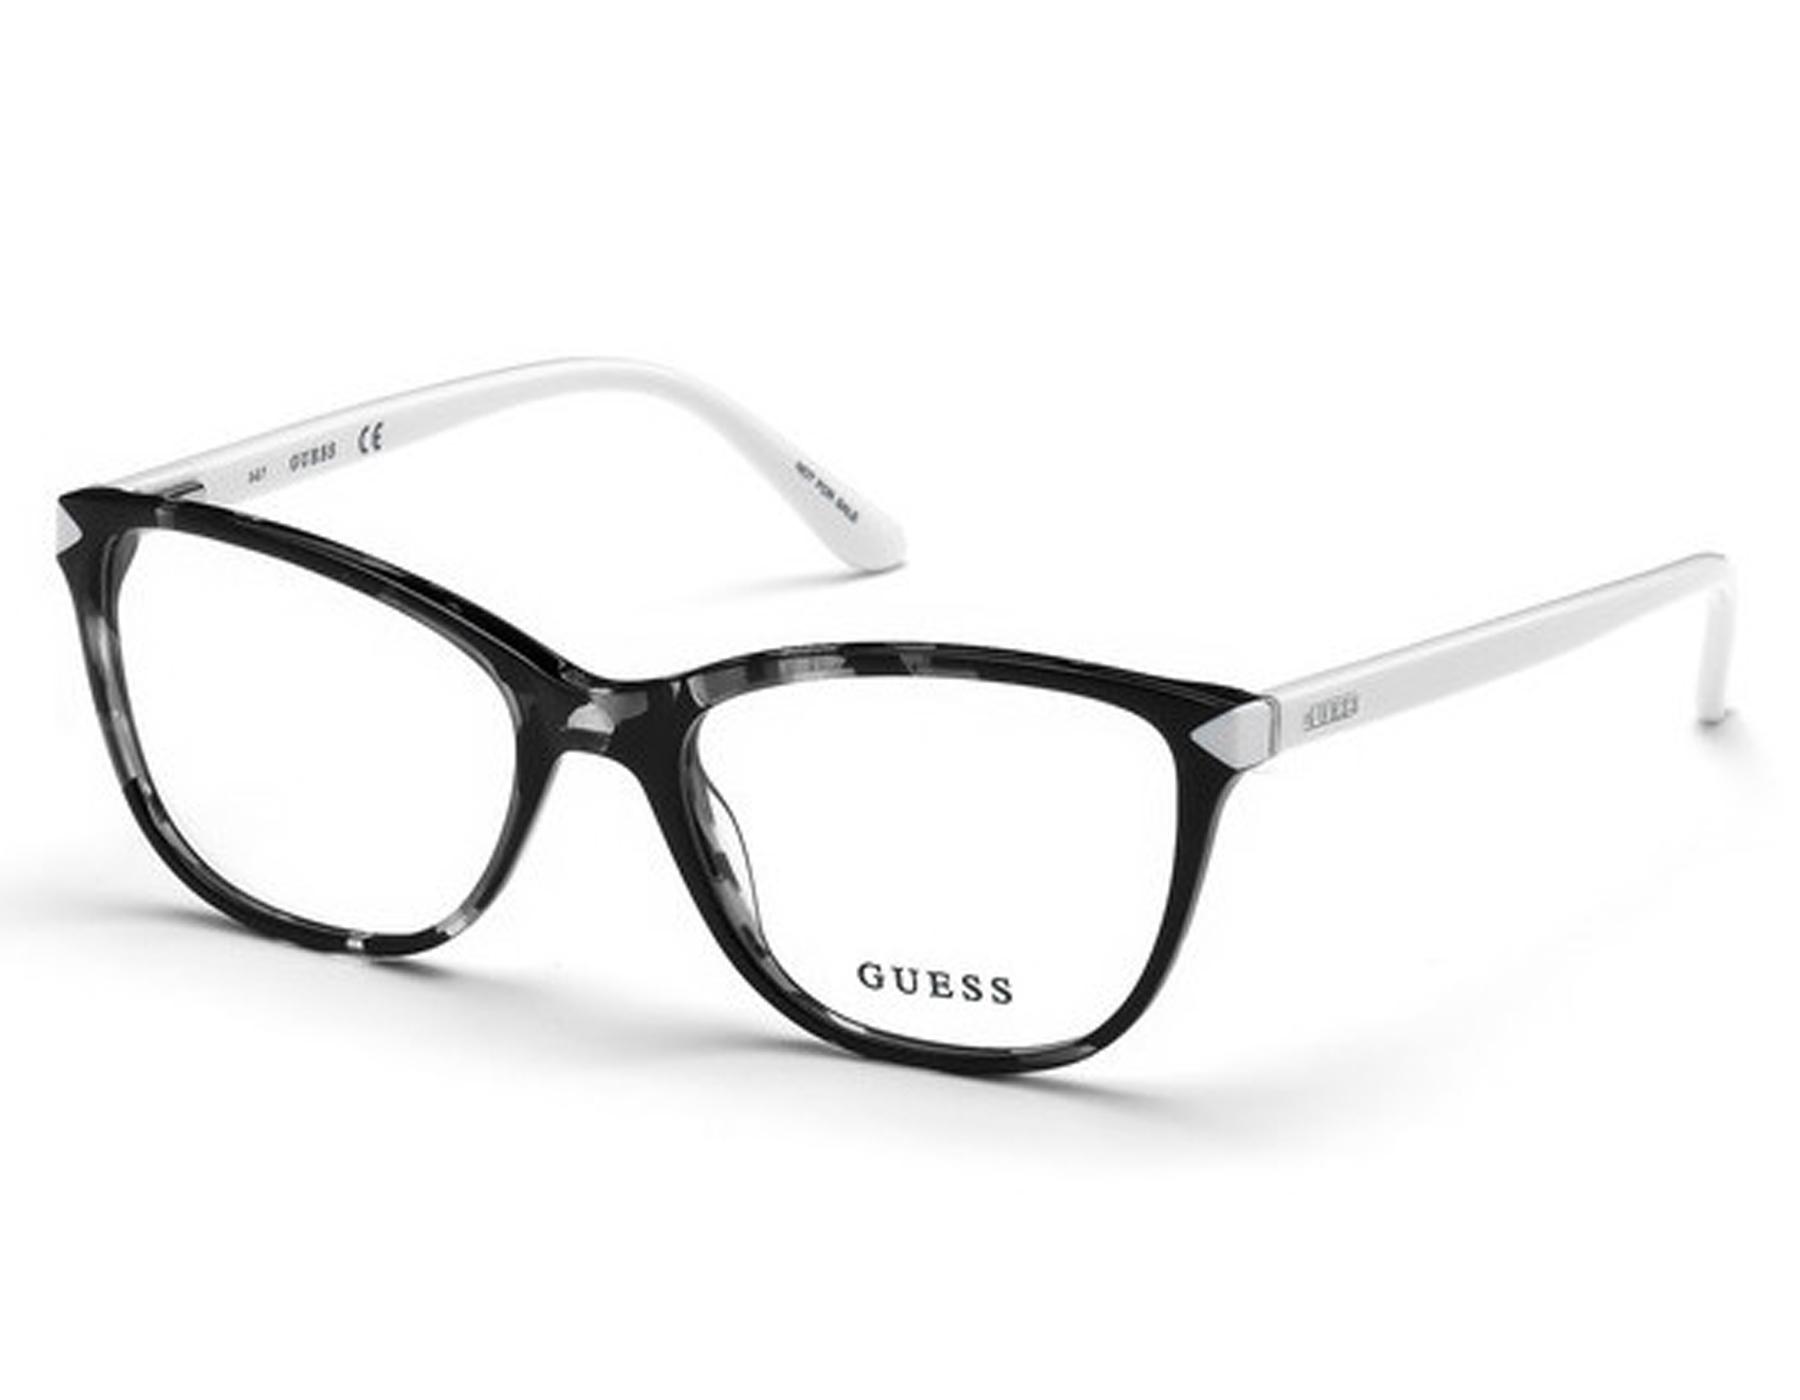 Details about NEW Guess GU 2673 001 53mm Shiny Black Optical Eyeglasses  Frames 1e44db4784